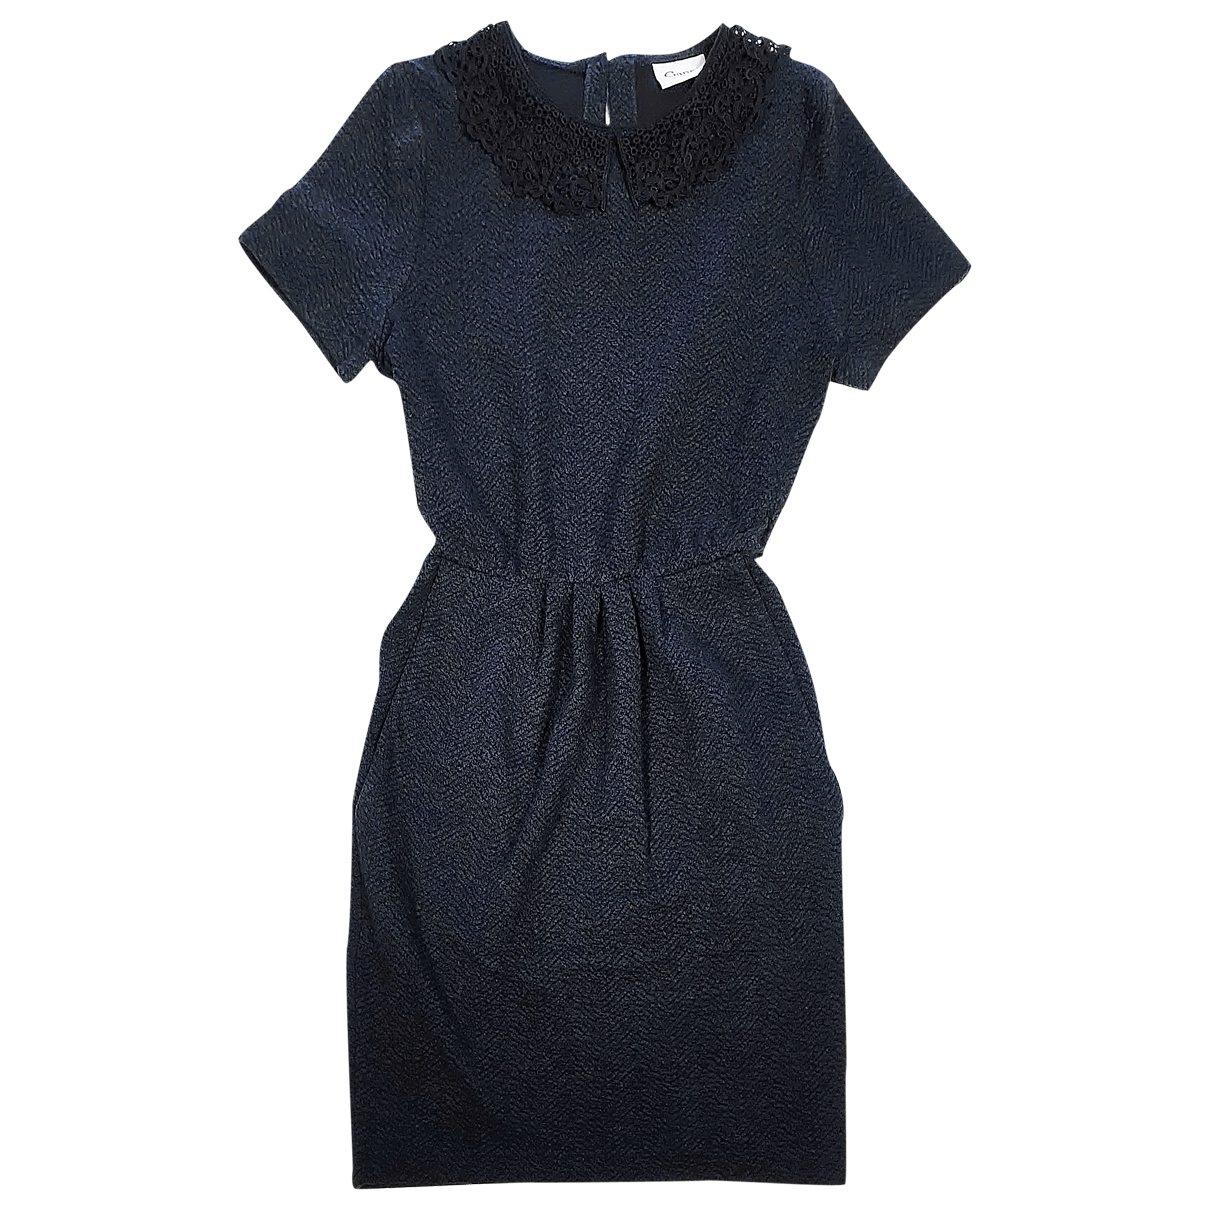 Ganni \N Kleid in  Blau Synthetik